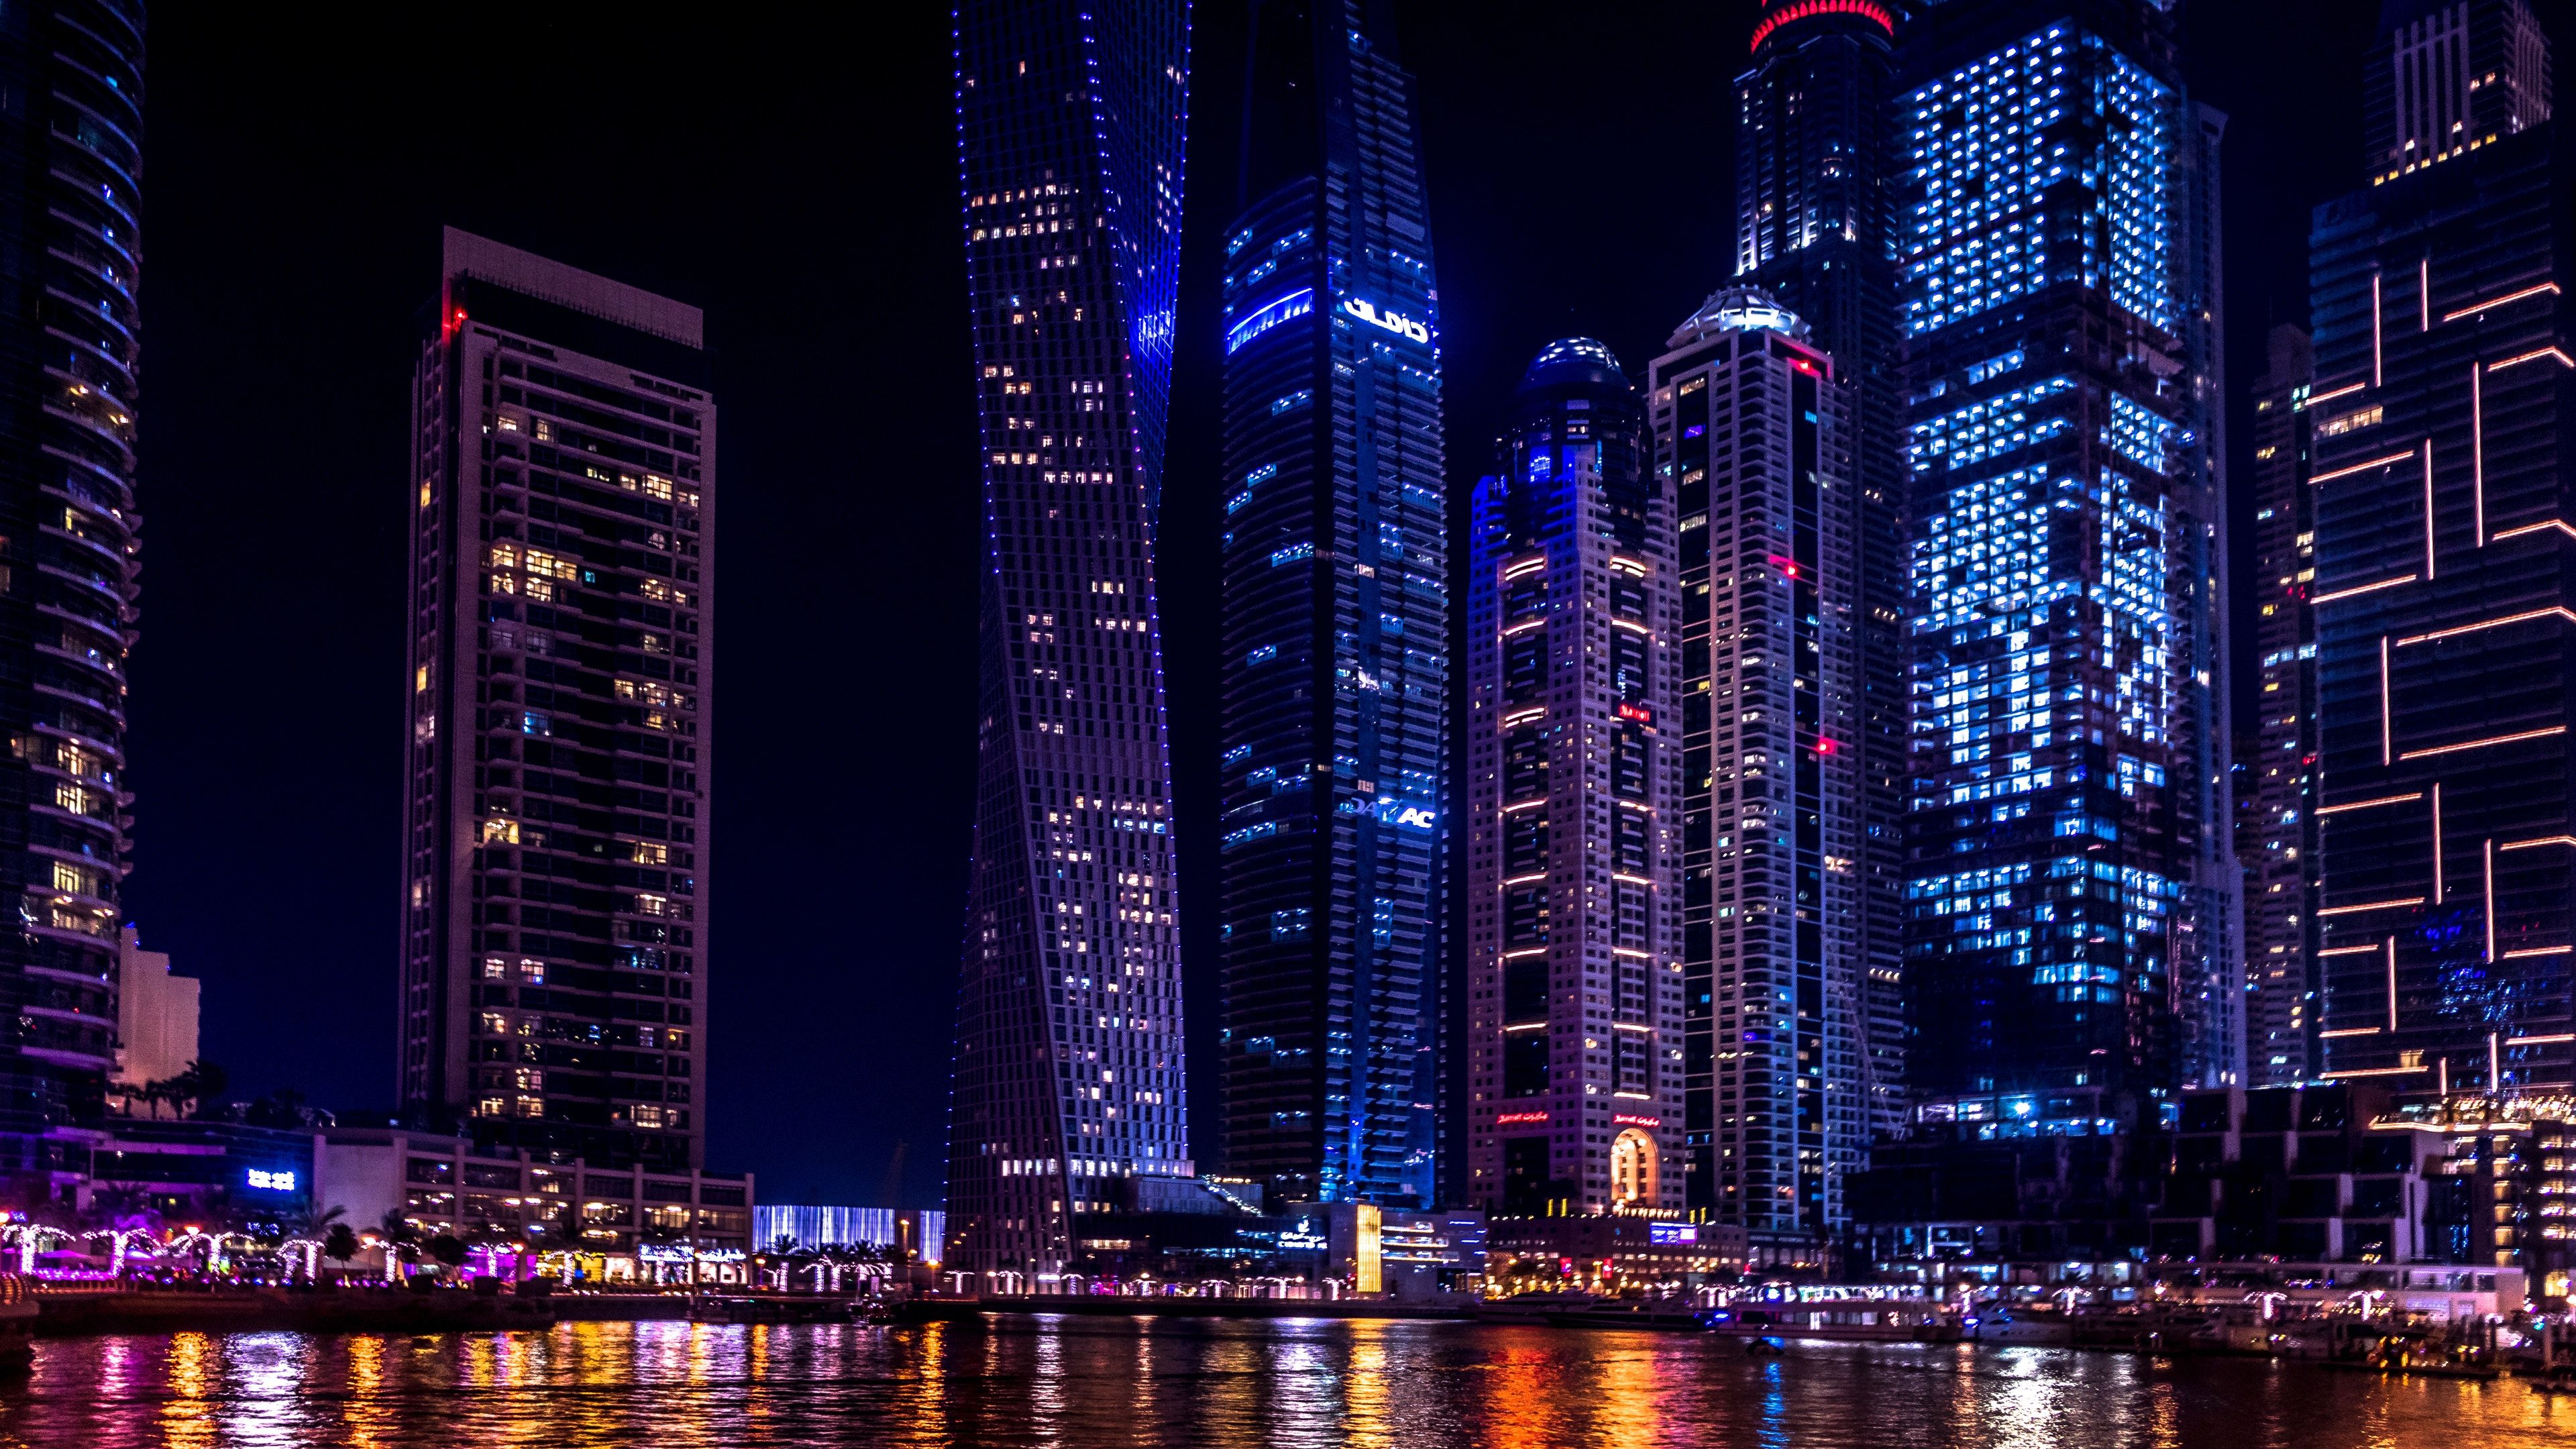 Dubai City Night View 3840 2160 Dubai City Cool Places To Visit Visit Dubai